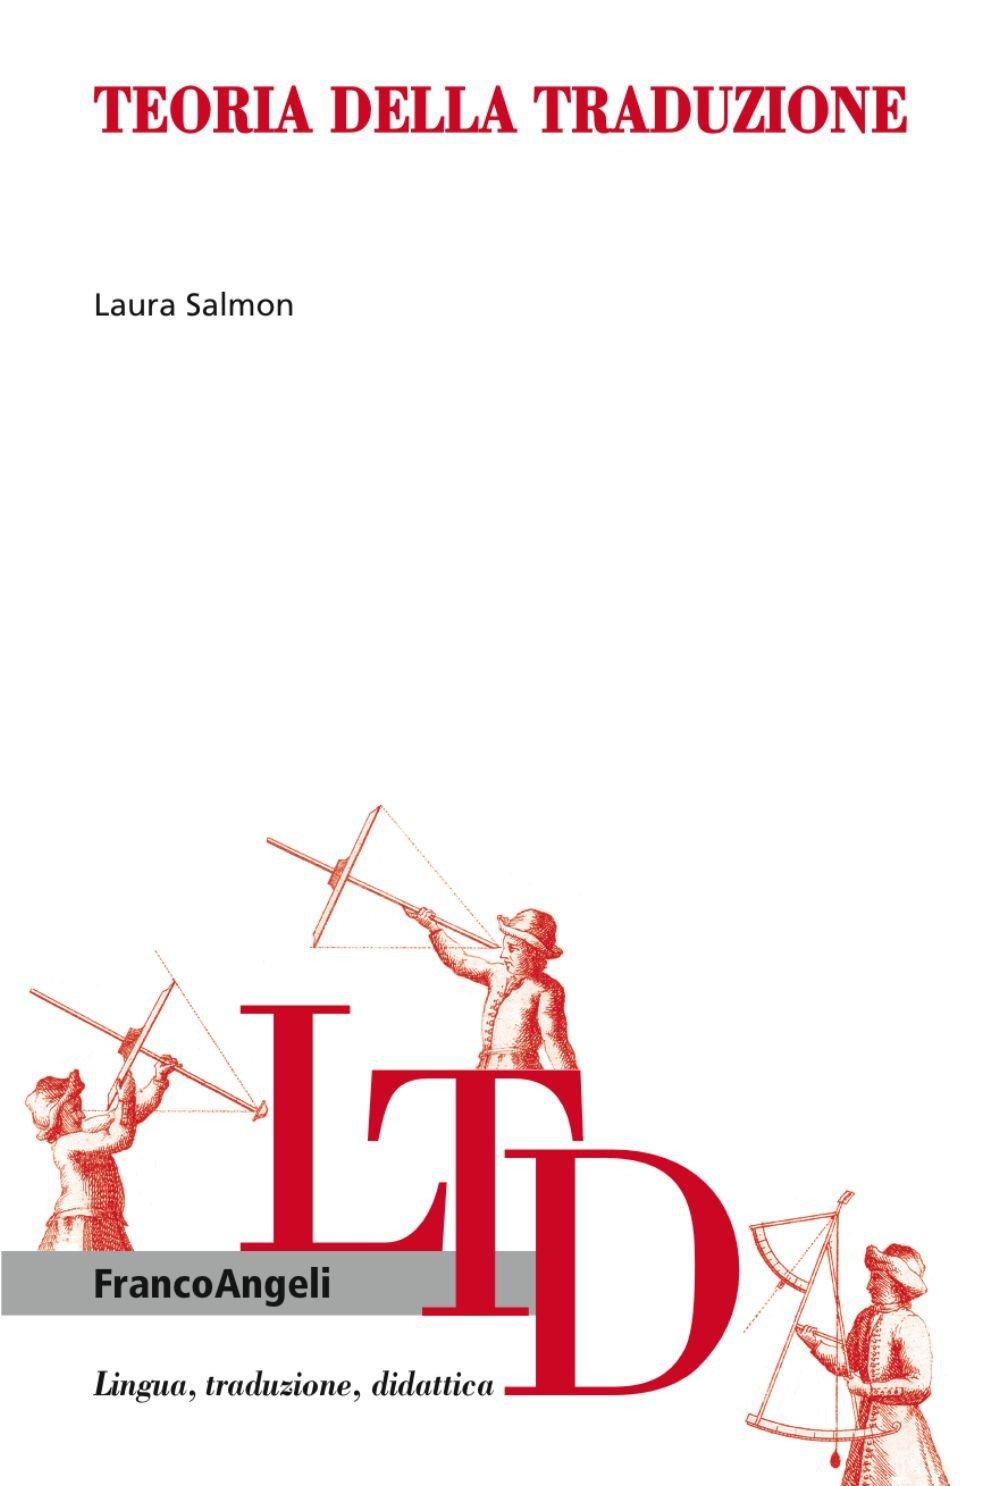 Teoria della traduzione Lingua, traduzione e didattica: Amazon.es: Salmon, Laura: Libros en idiomas extranjeros